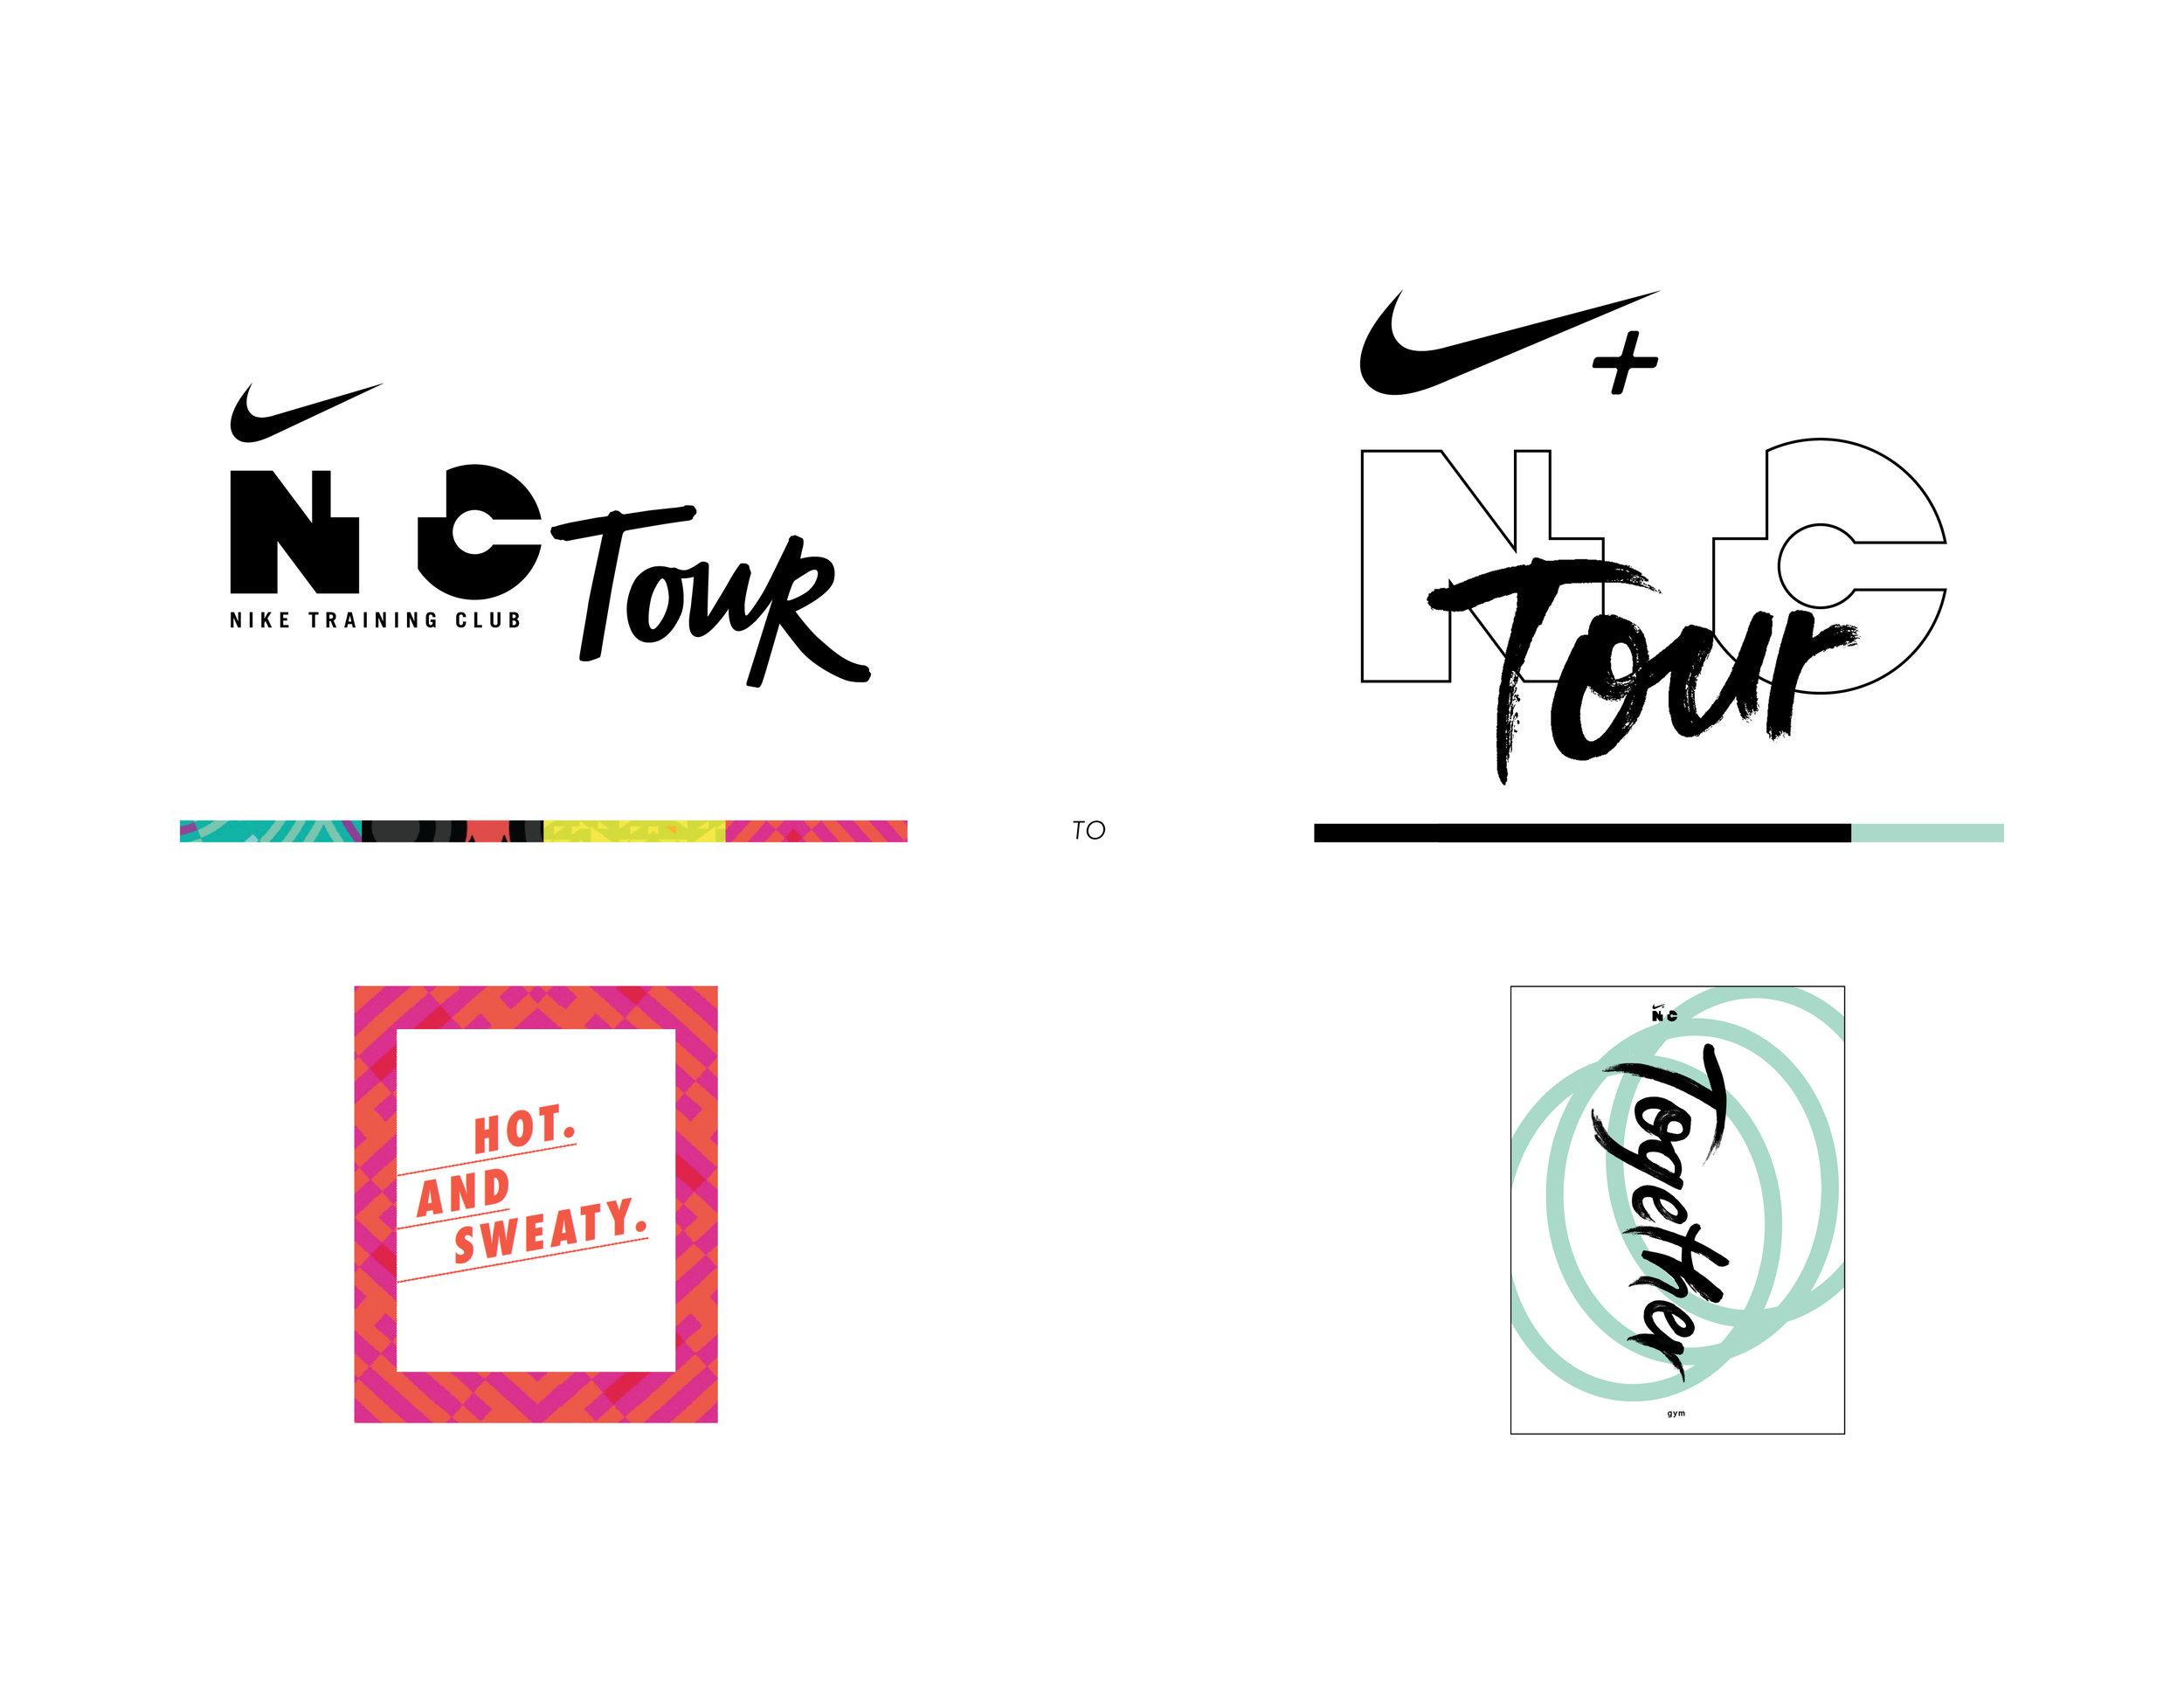 NTC Tour Images2.jpg